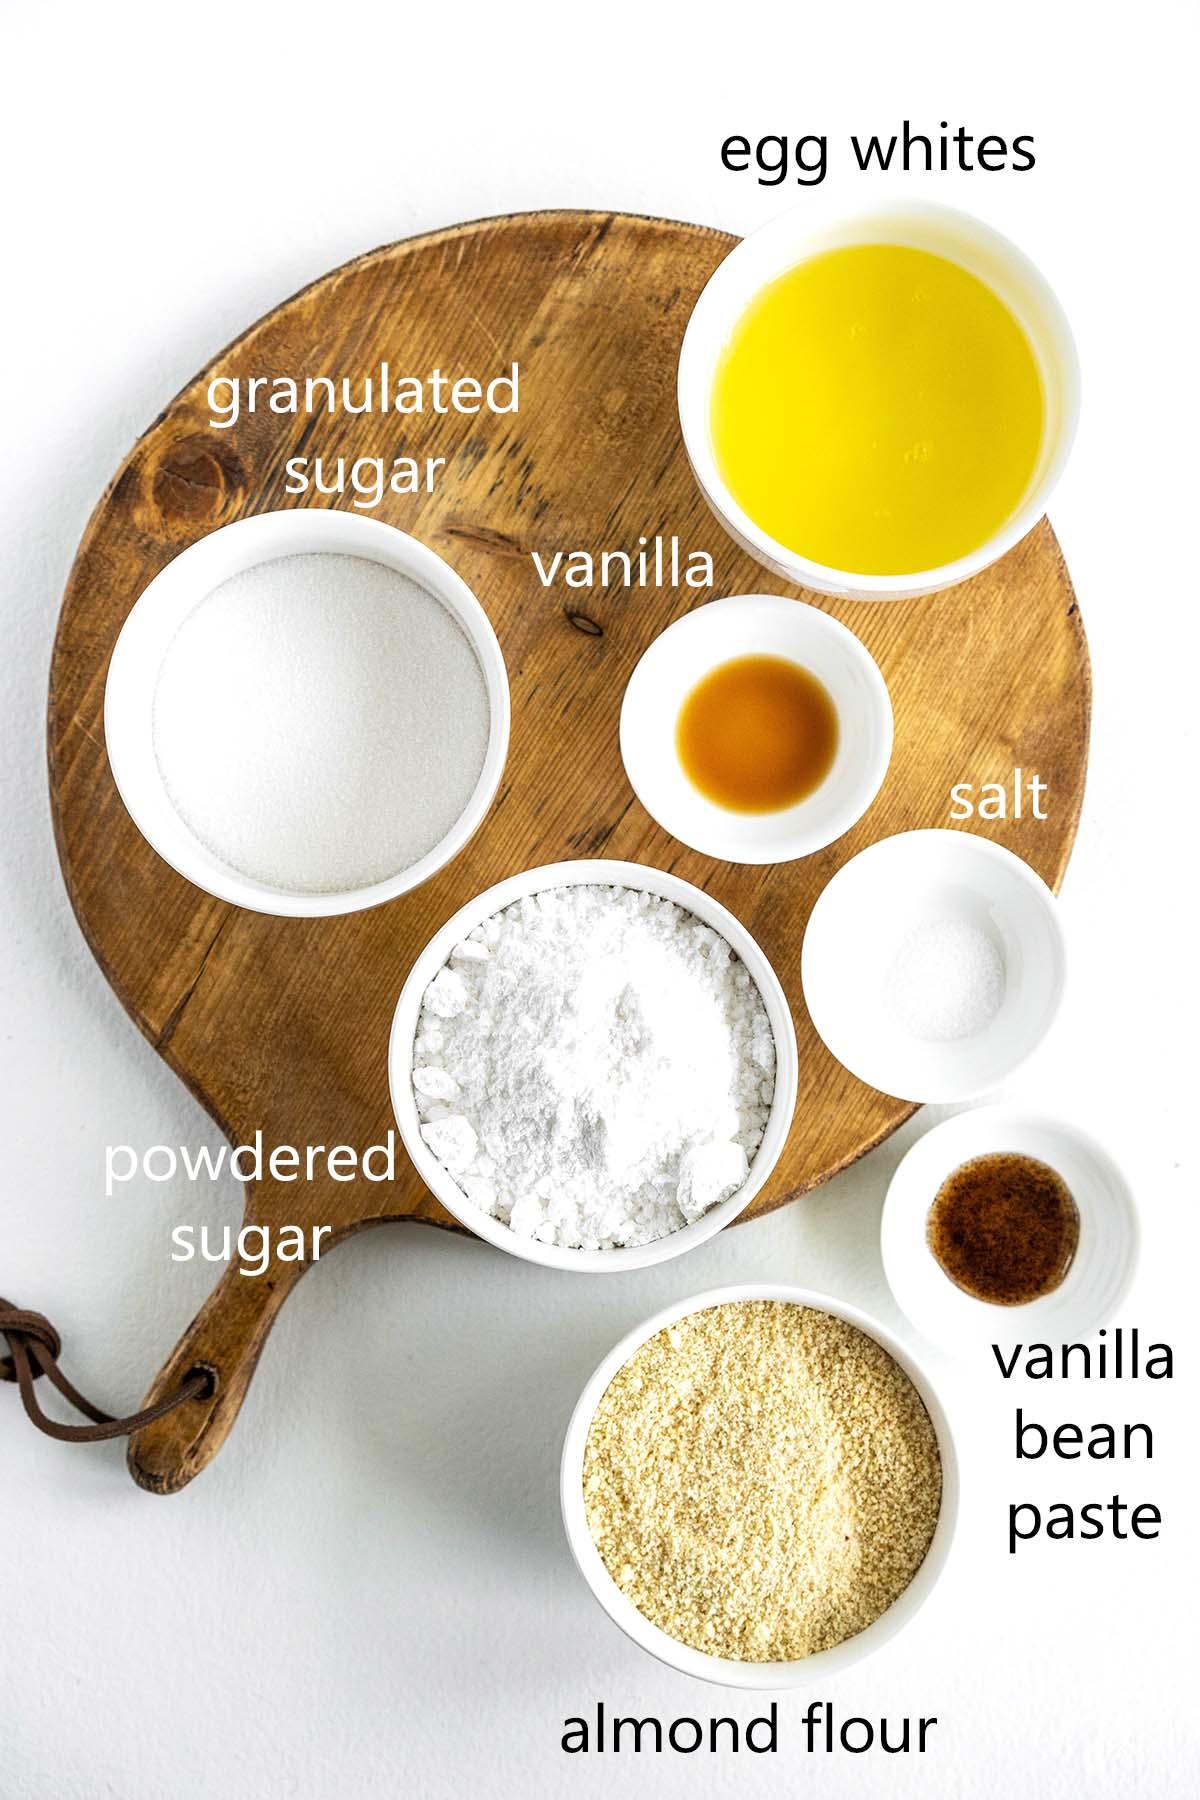 french macaron ingredients